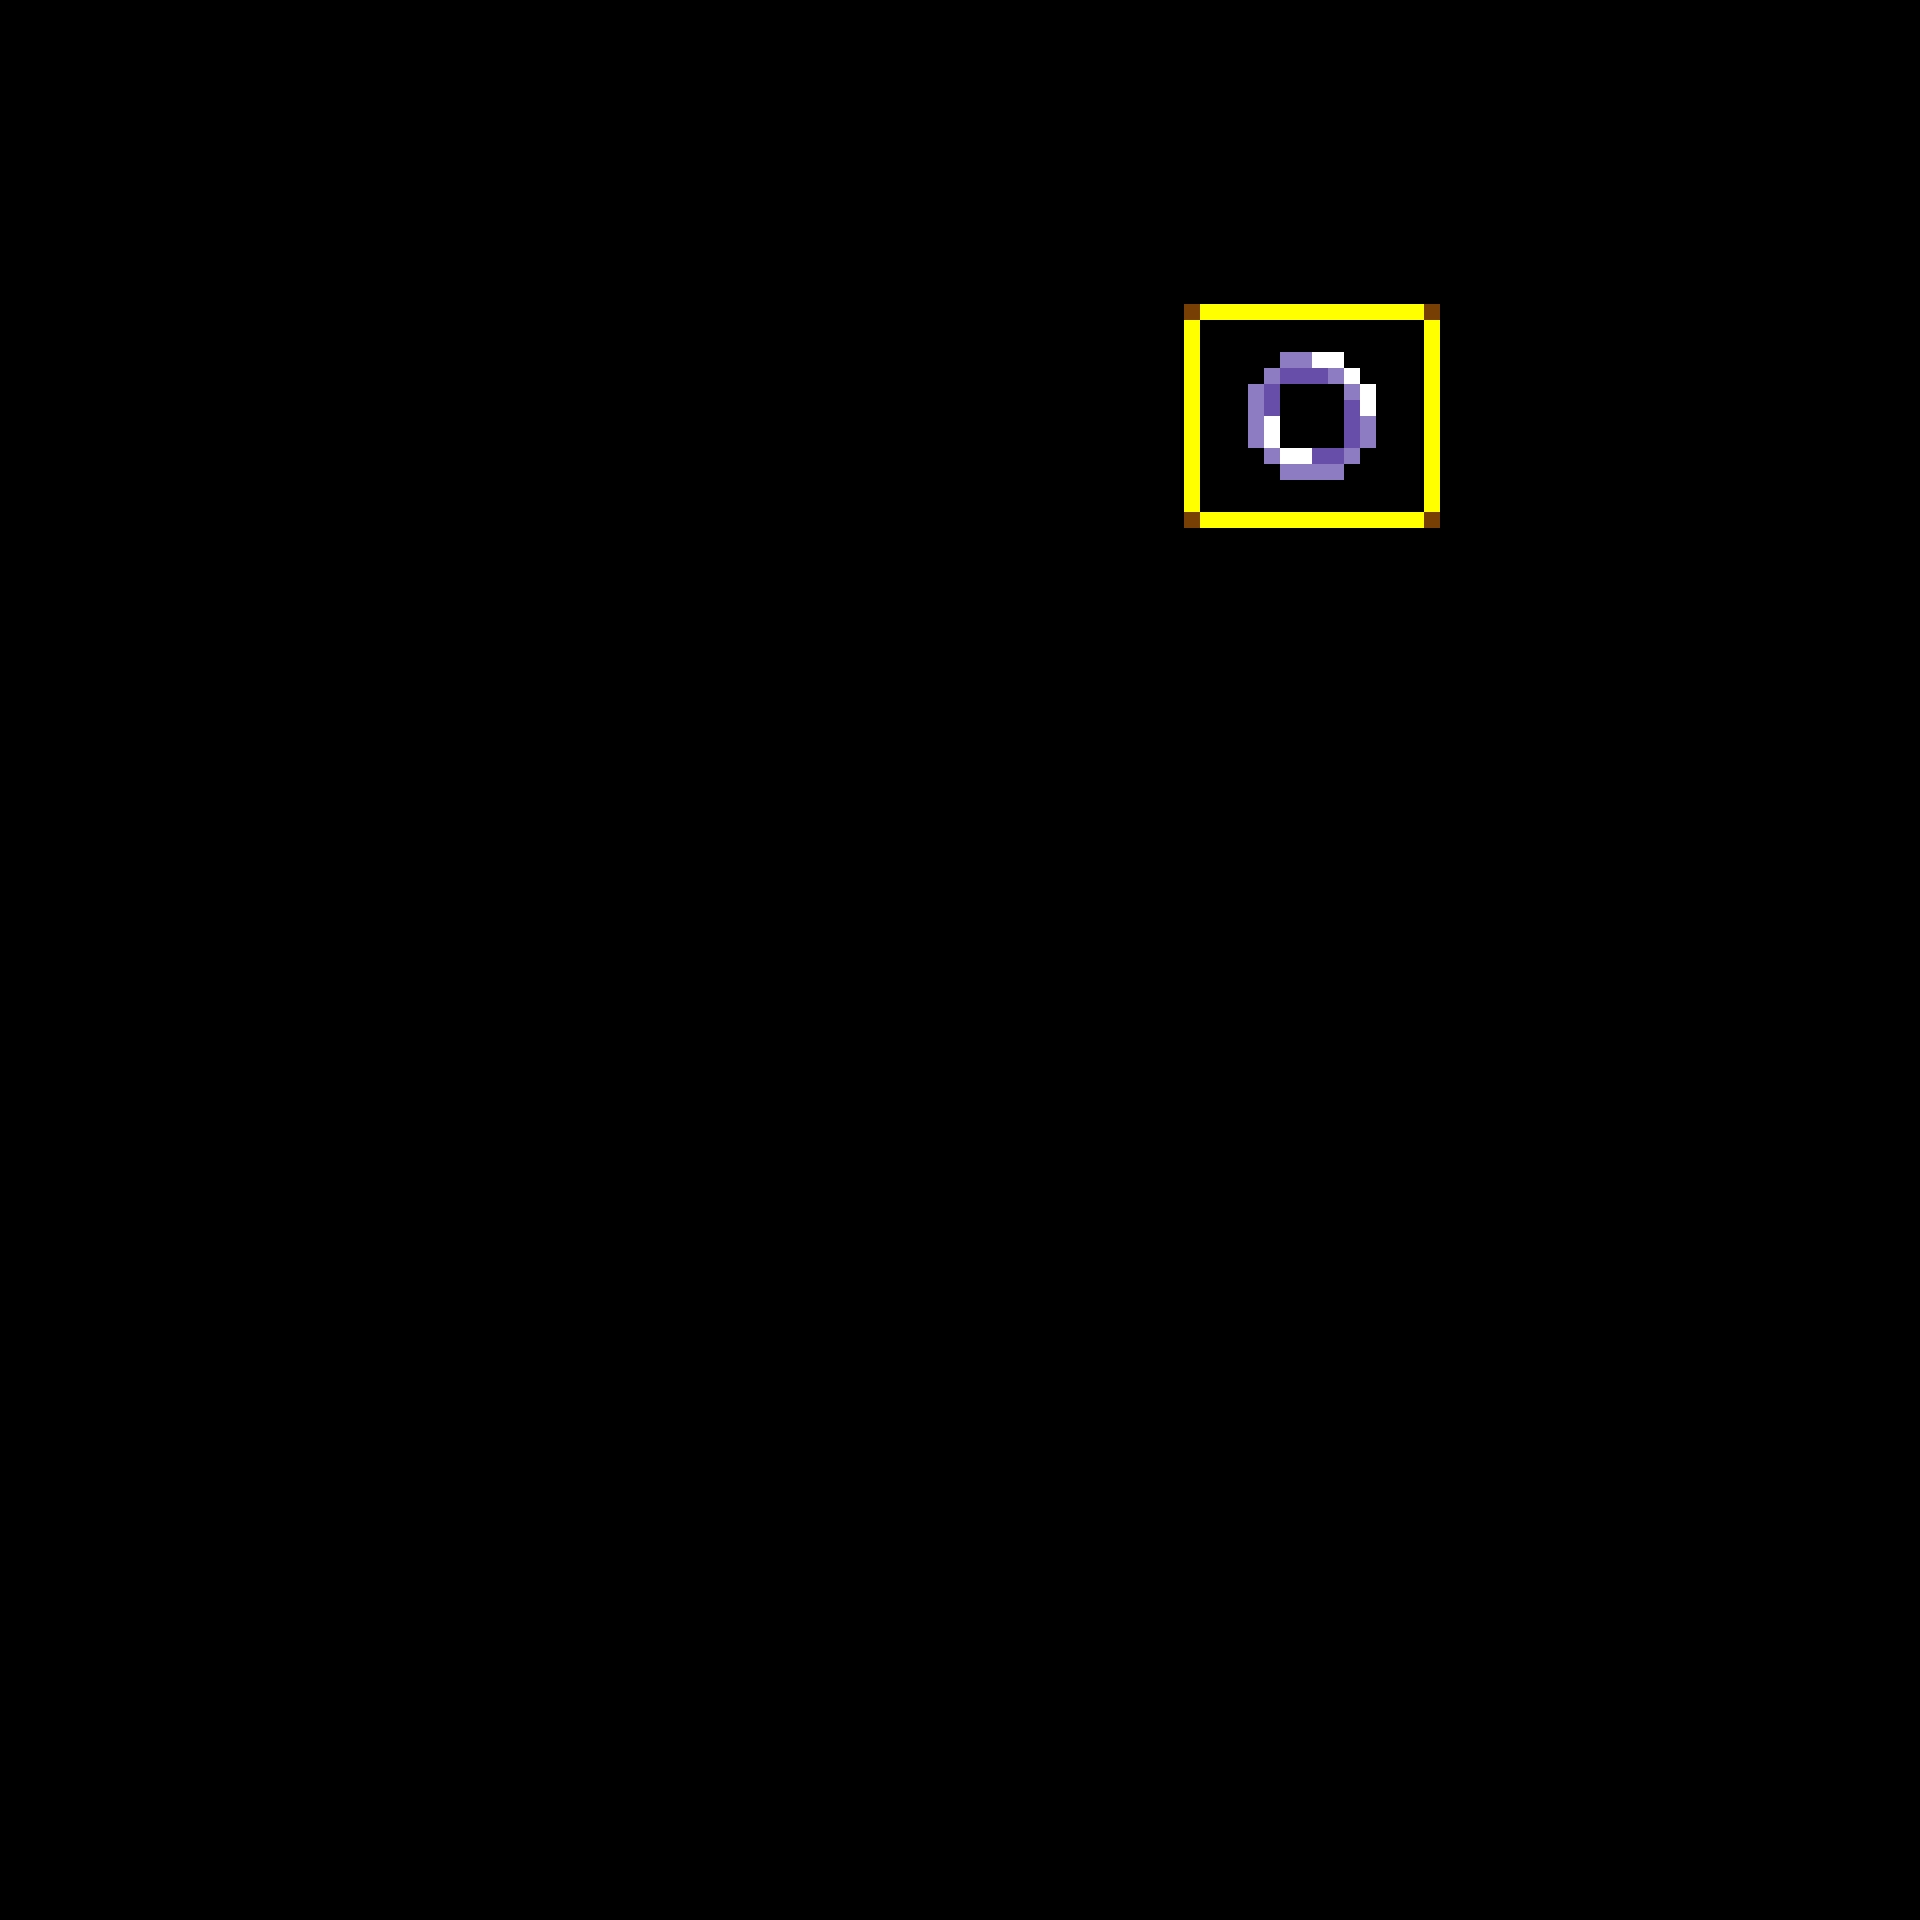 Sonic CD unused monitor effect